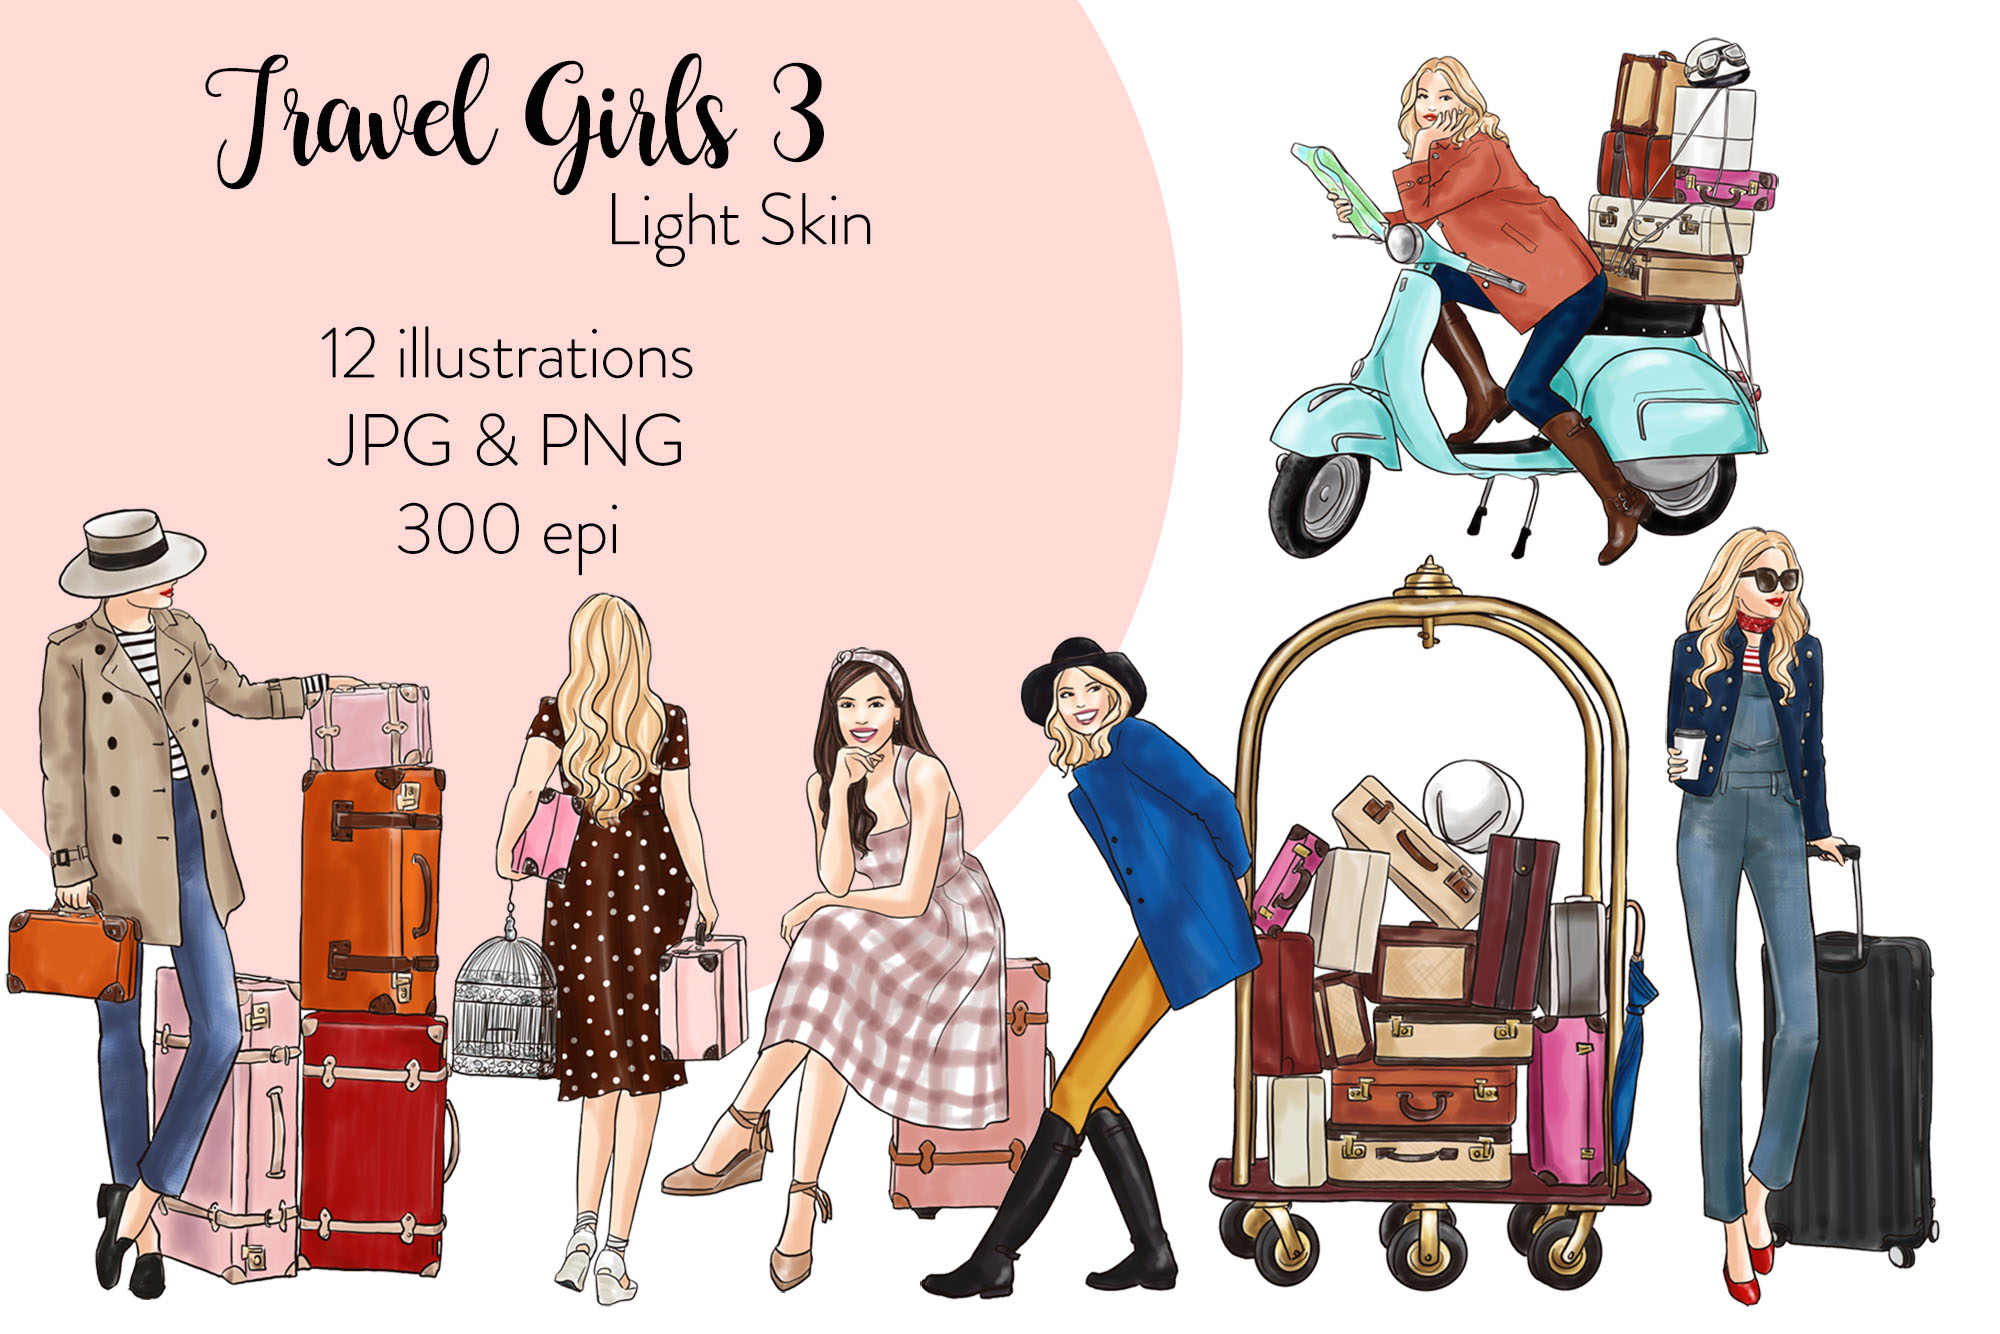 Fashion illustration clipart - Travel Girls 3 - Light Skin example image 1